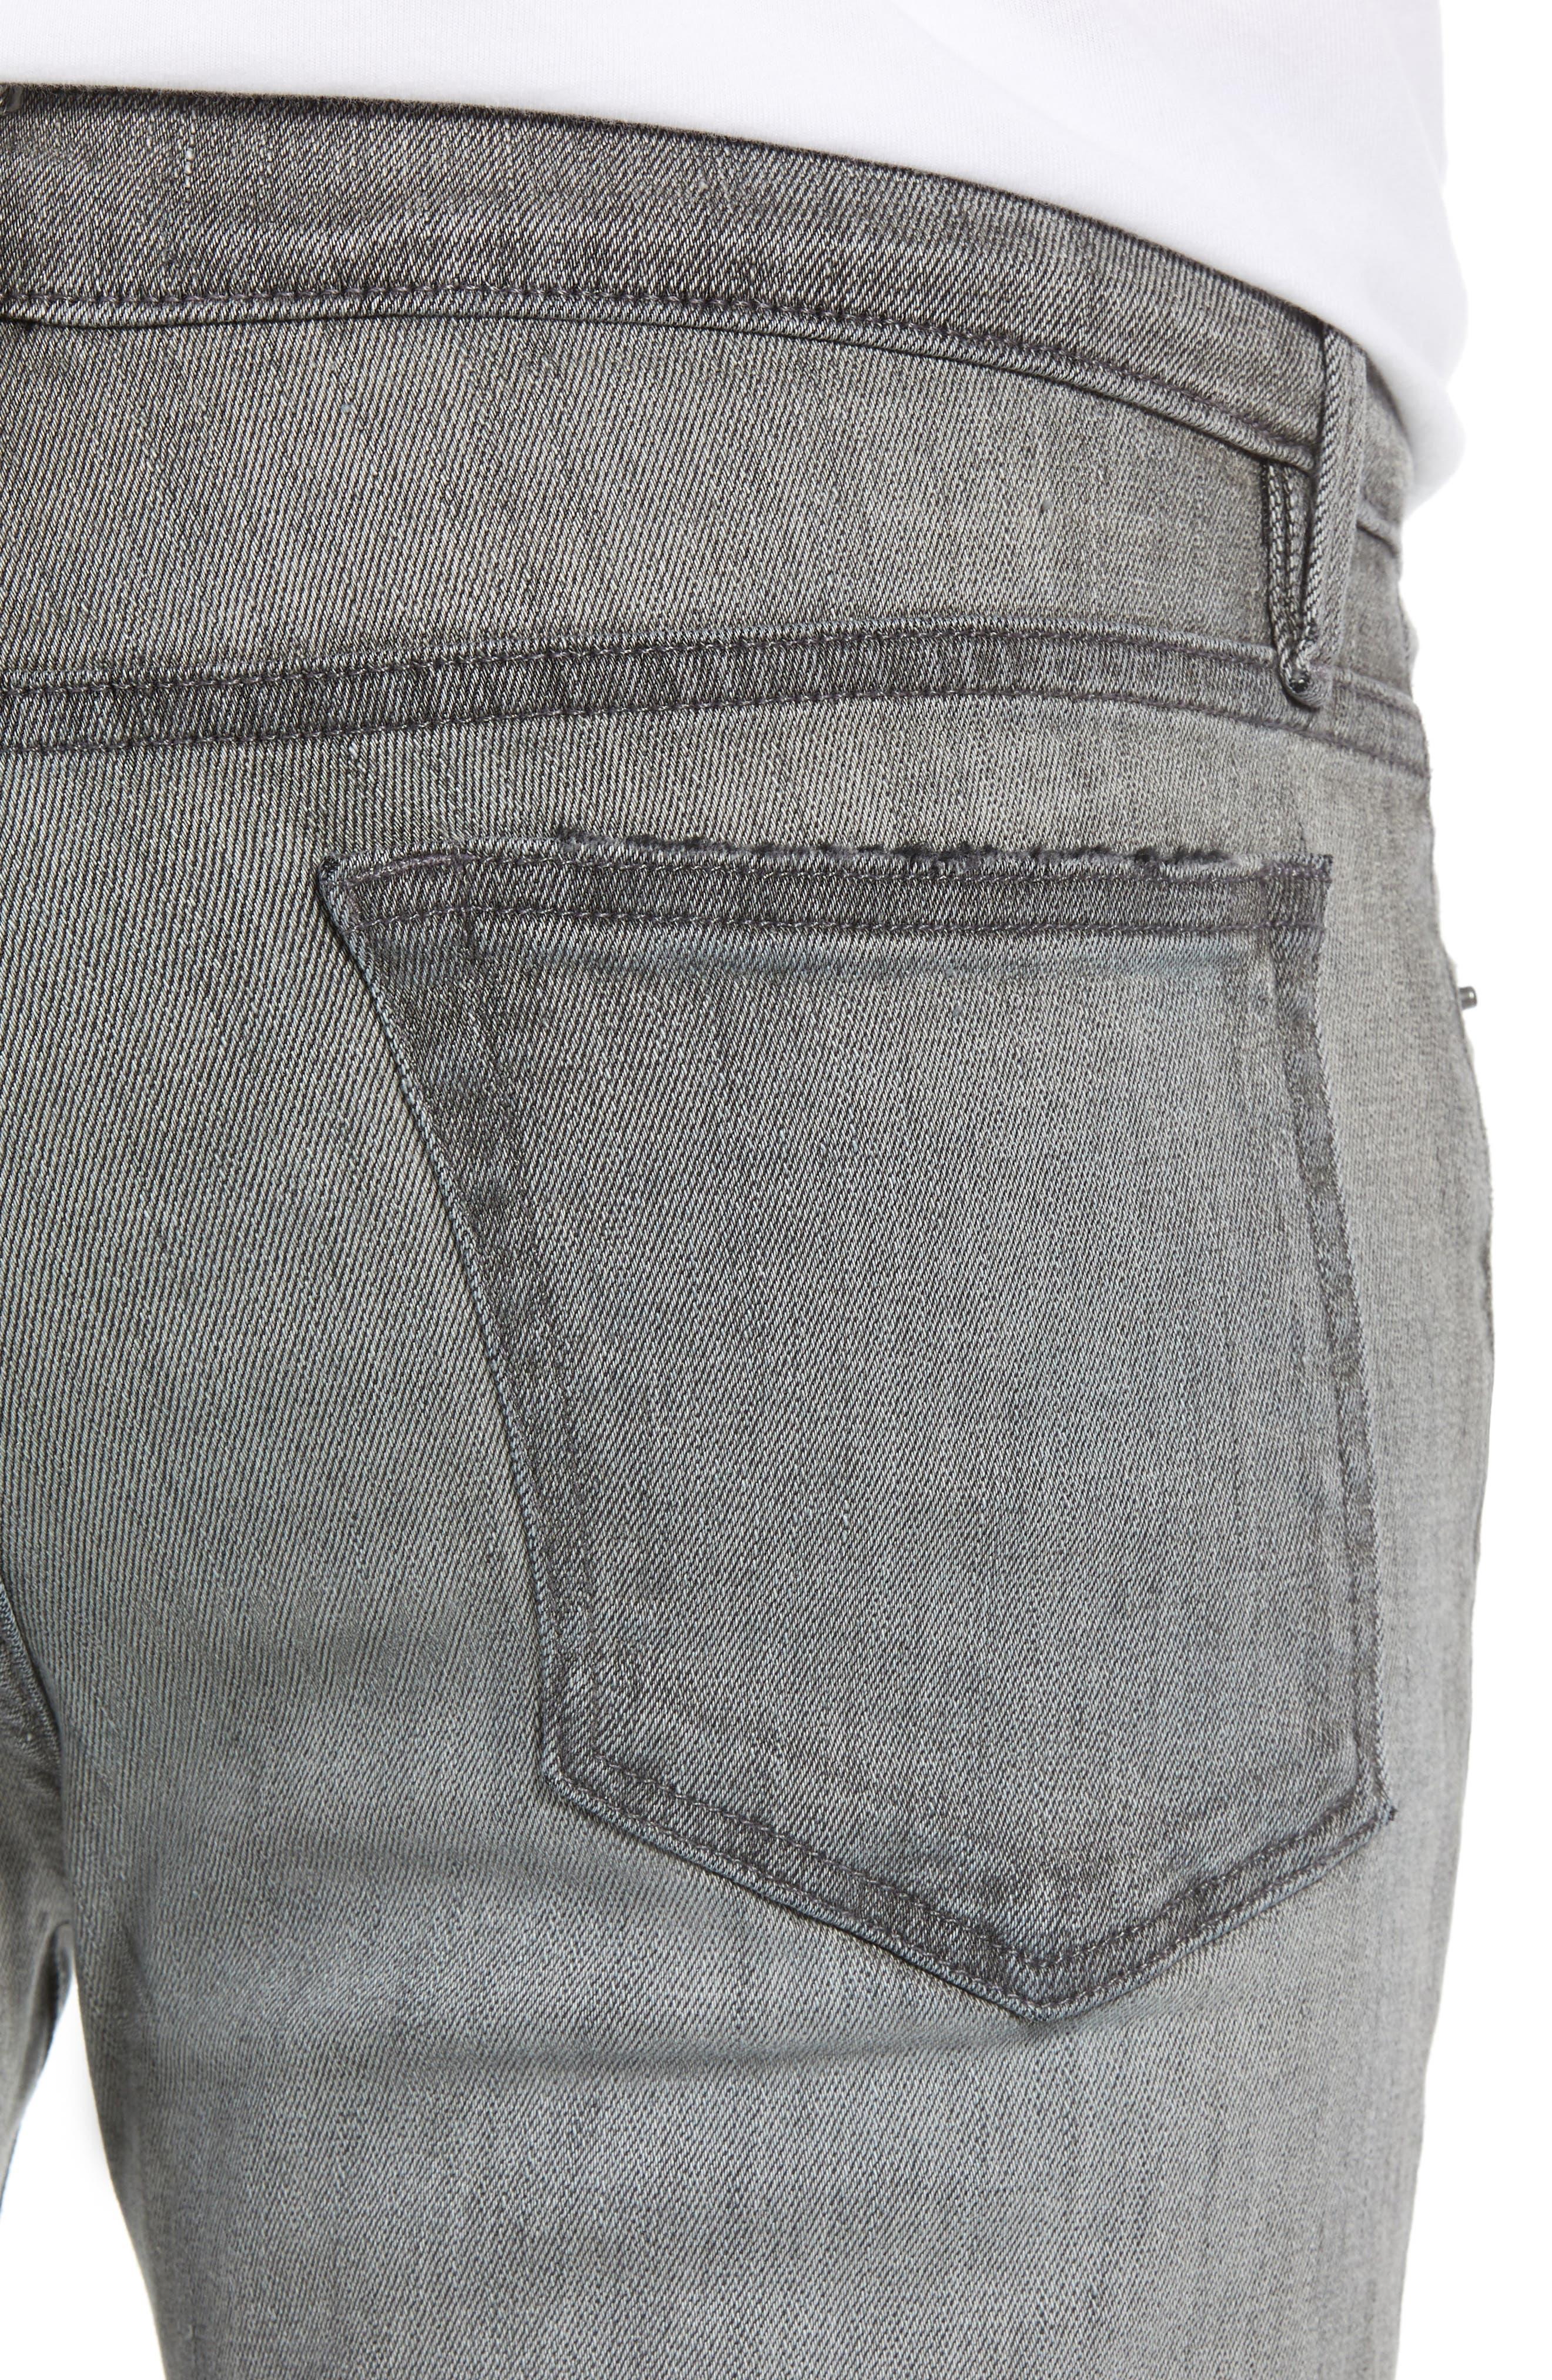 L'Homme Skinny Skinny Fit Jeans,                             Alternate thumbnail 4, color,                             FORT MCHEN